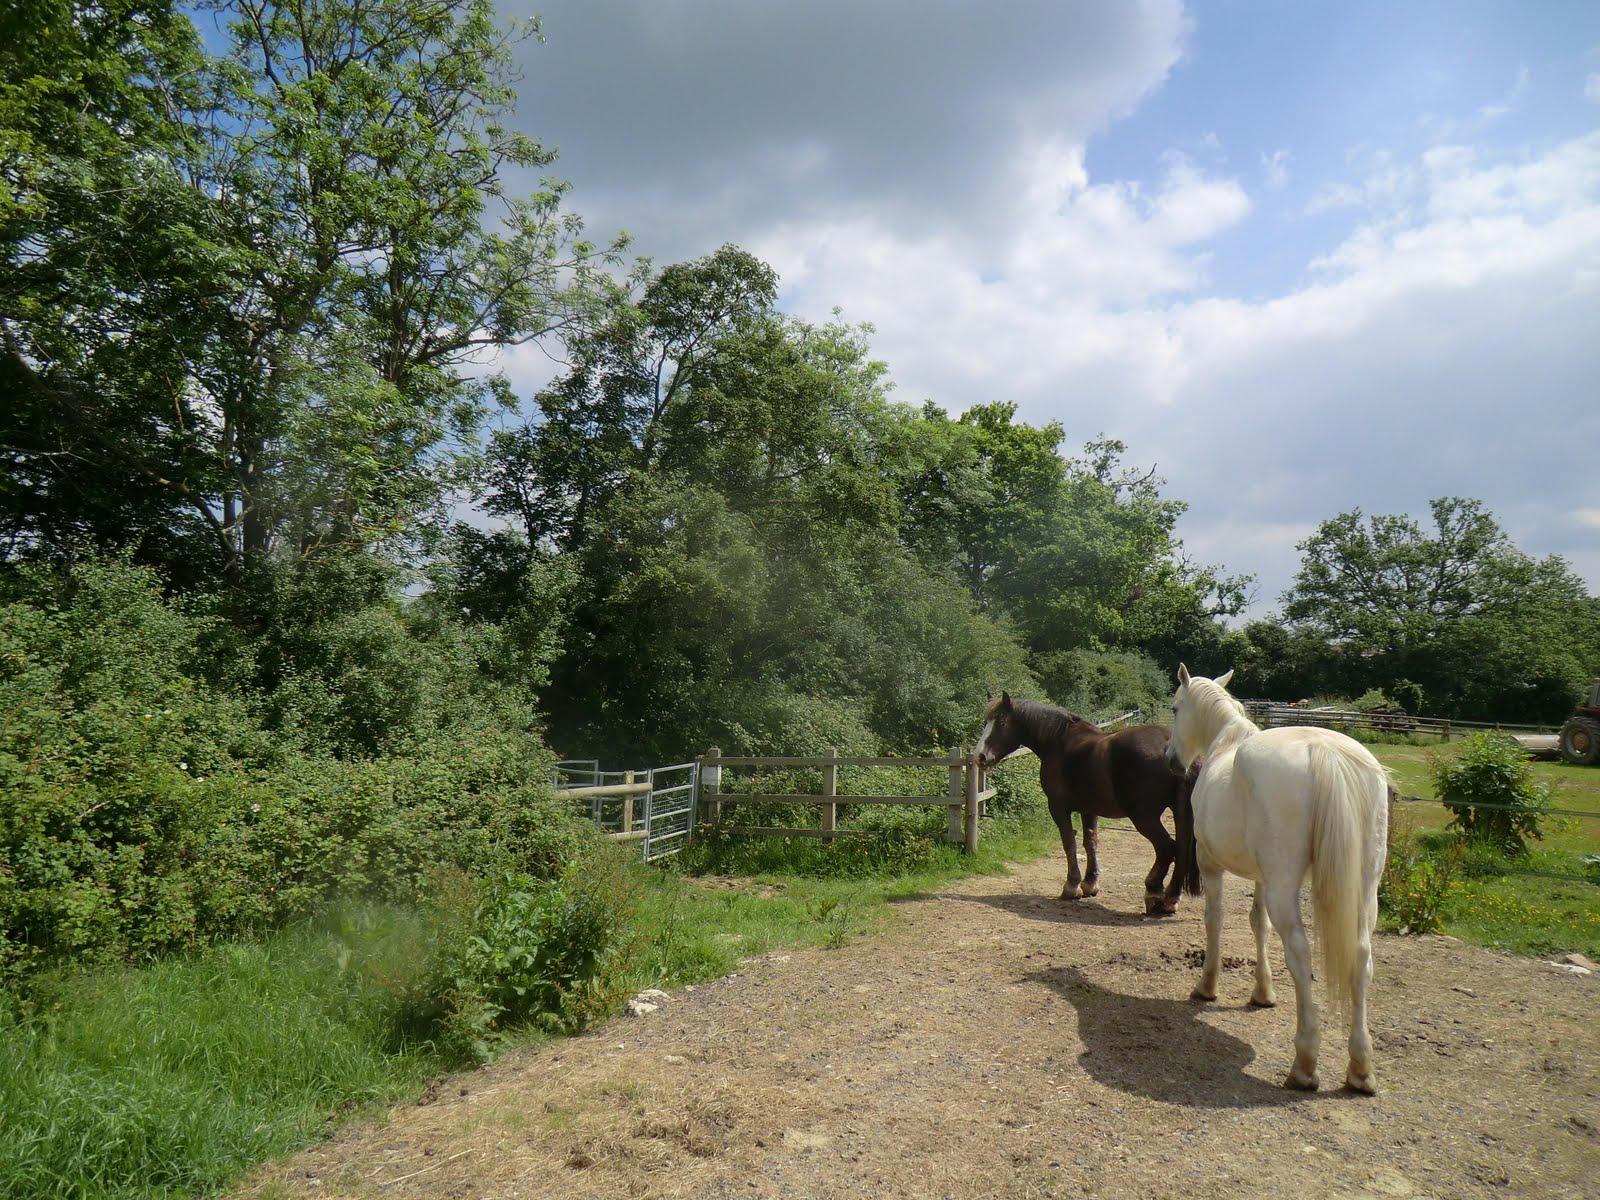 CIMG1793 Horses at Riding School